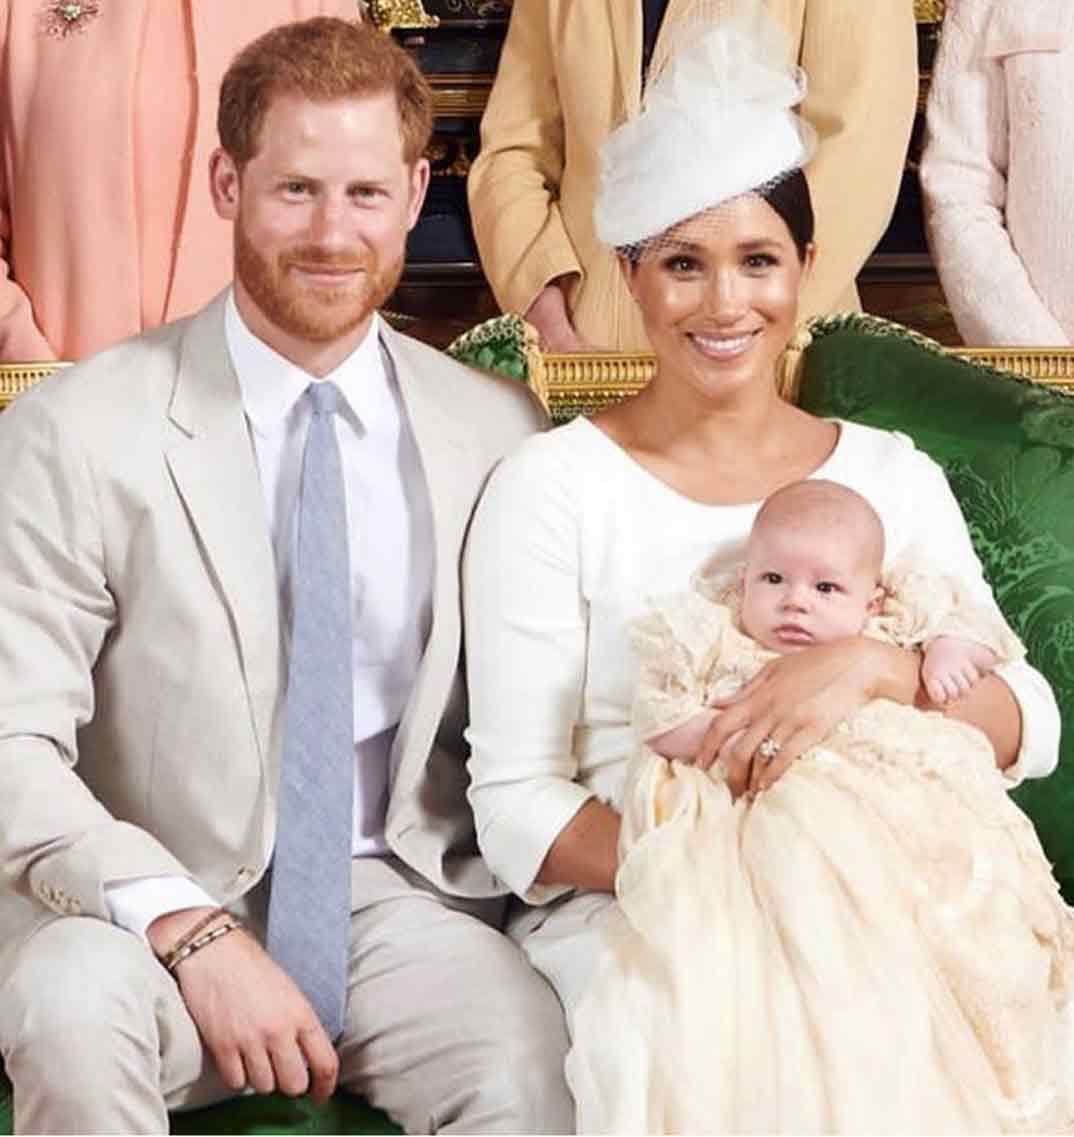 Meghan Markle - Bautizo de Archie, hijo de los duques de Sussex © sussexroyal/Instagram